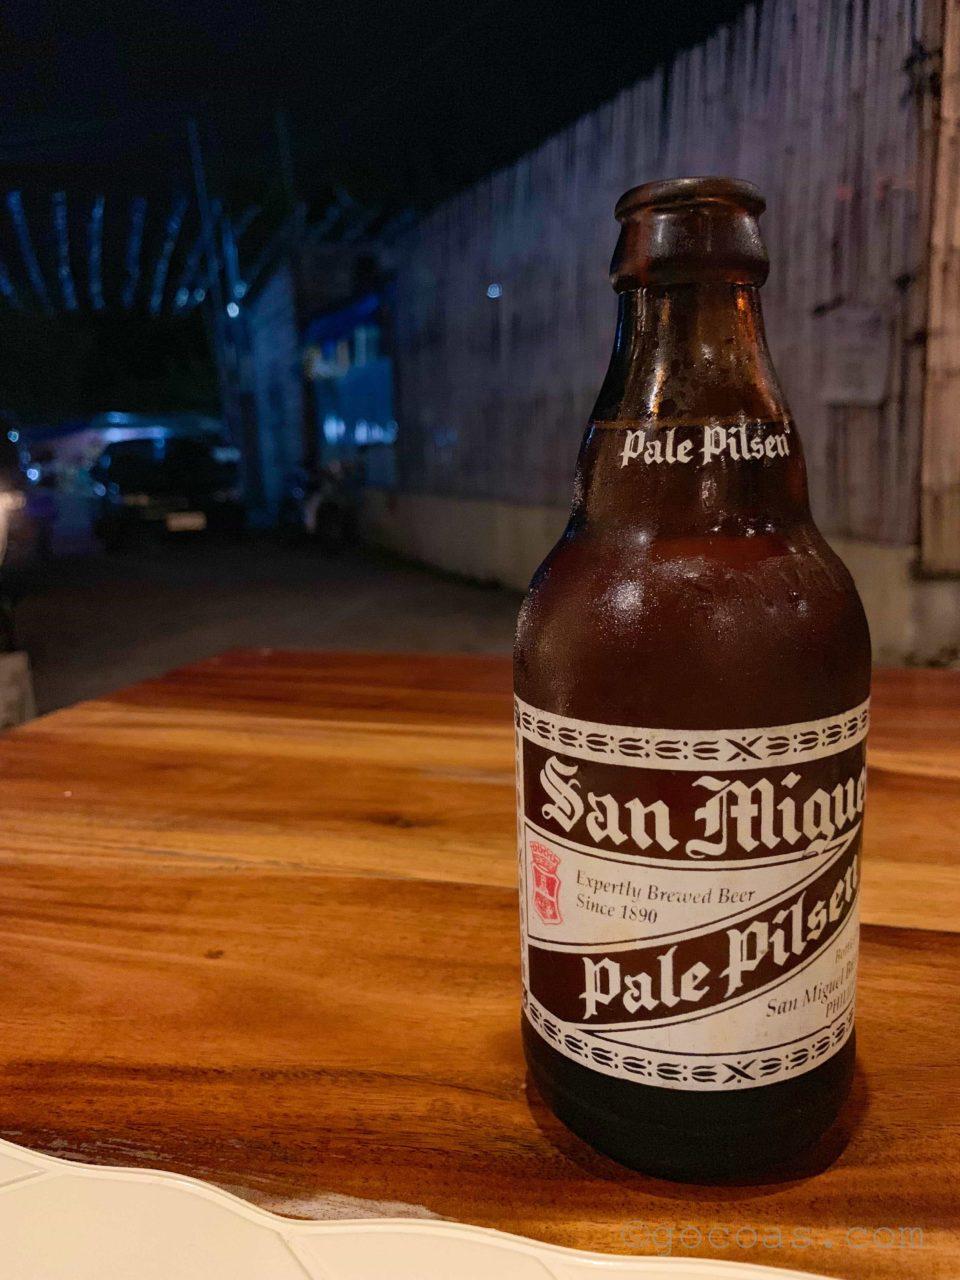 Paul&Madz Restaurantビール